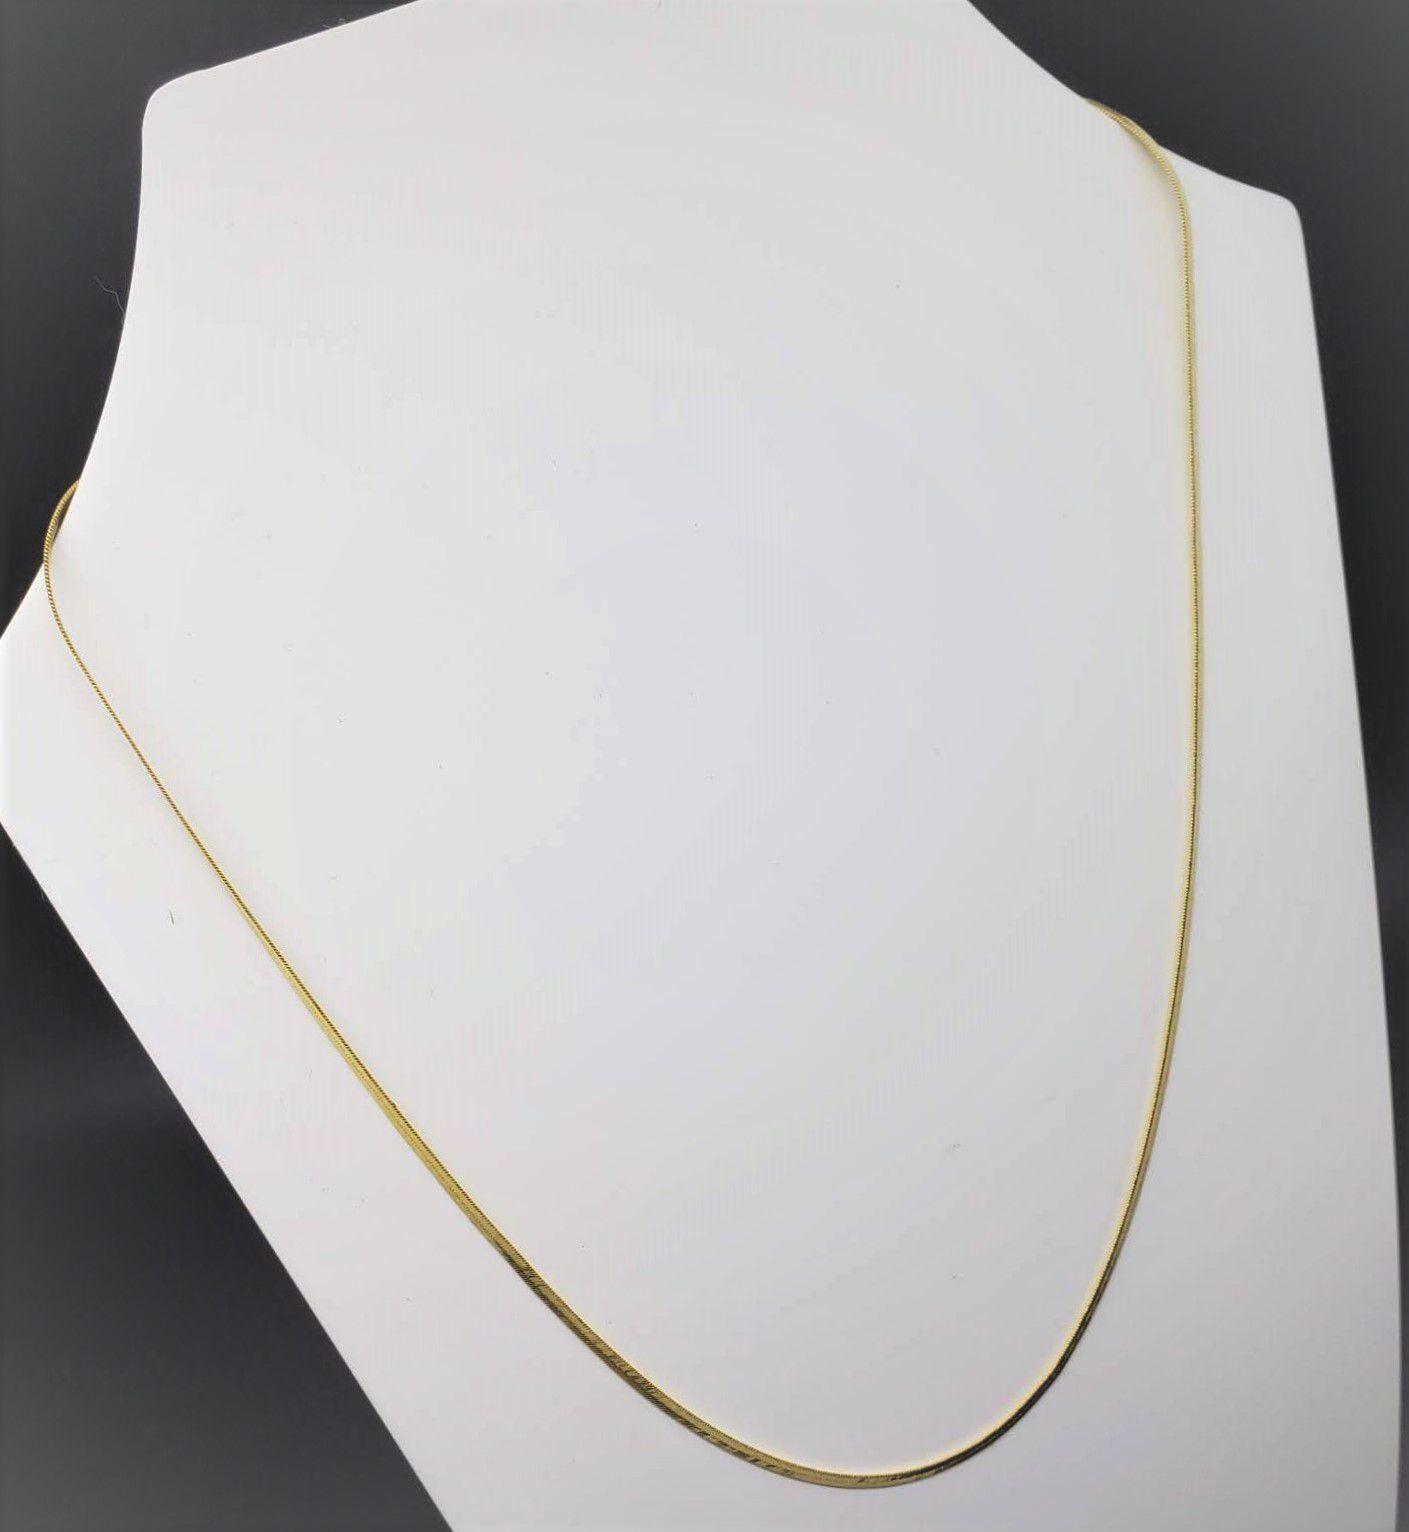 Gargantilha Malha Italiana 60cm Banho De Ouro 18k 1238